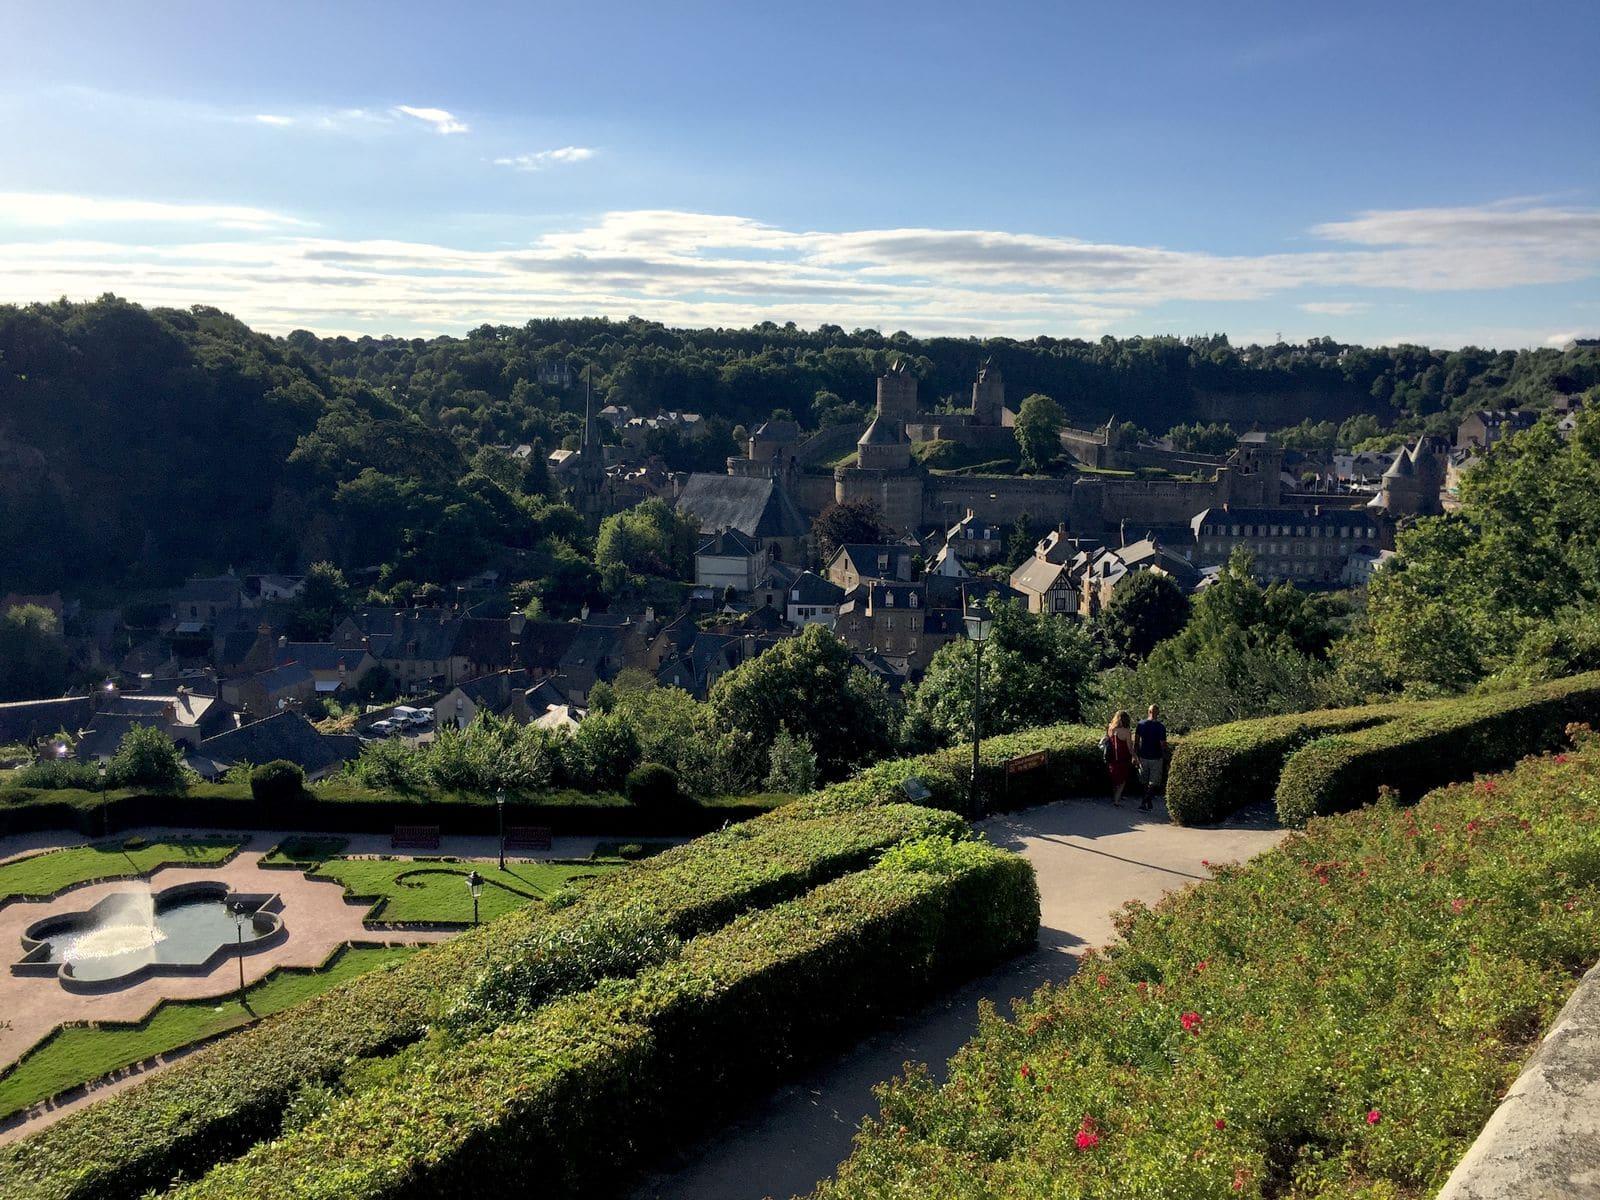 Vista dal giardino panoramico di Fougeres